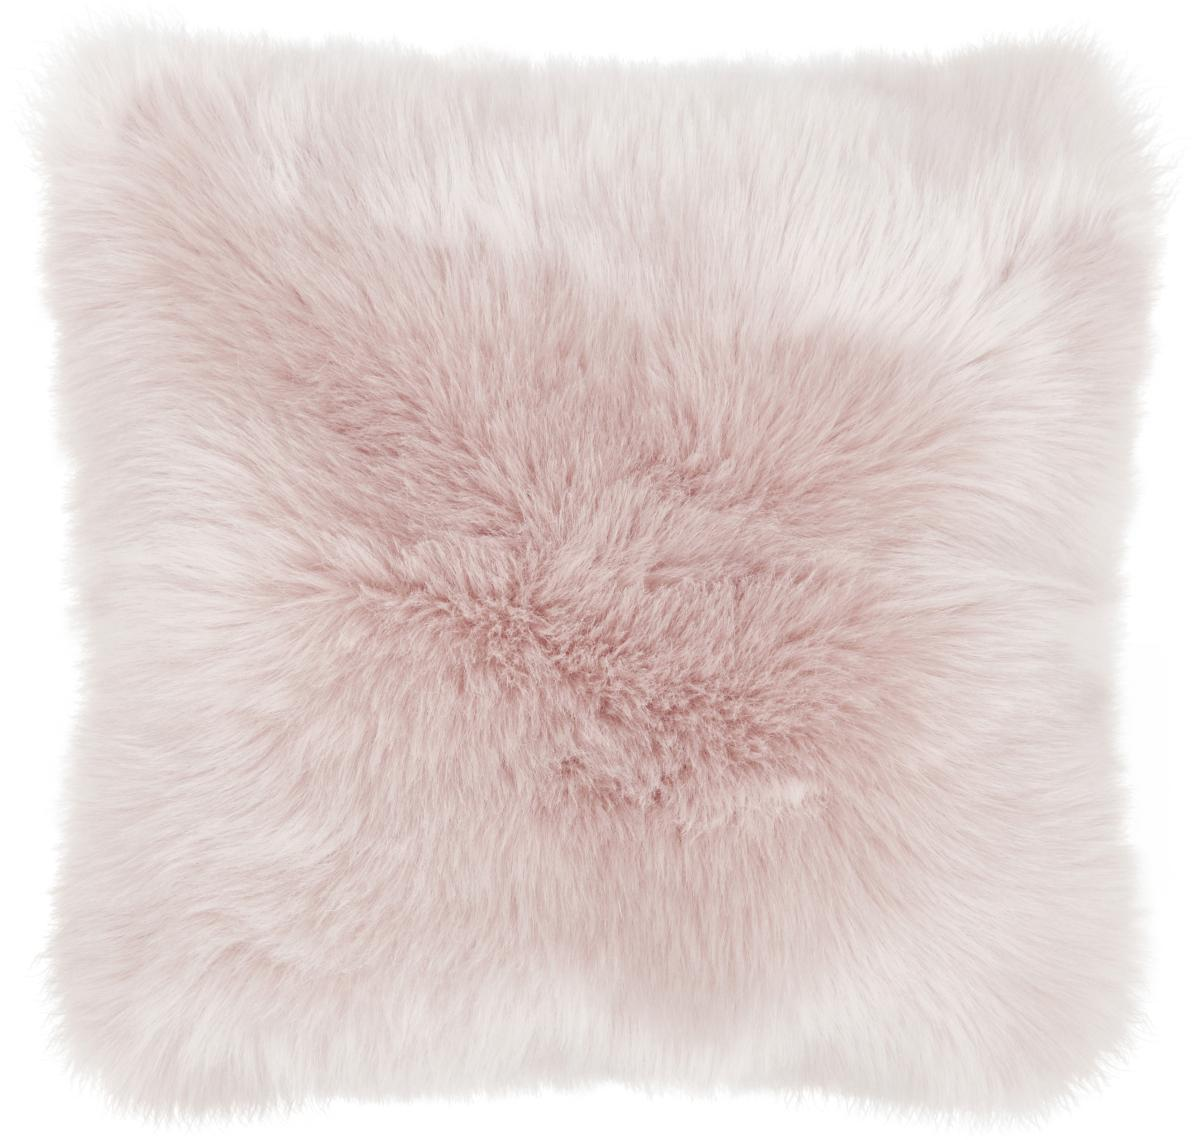 Flauschige Kunstfell-Kissenhülle Mathilde, glatt, Vorderseite: 67% Acryl, 33% Polyester, Rückseite: 100% Polyester, Rosa, 40 x 40 cm